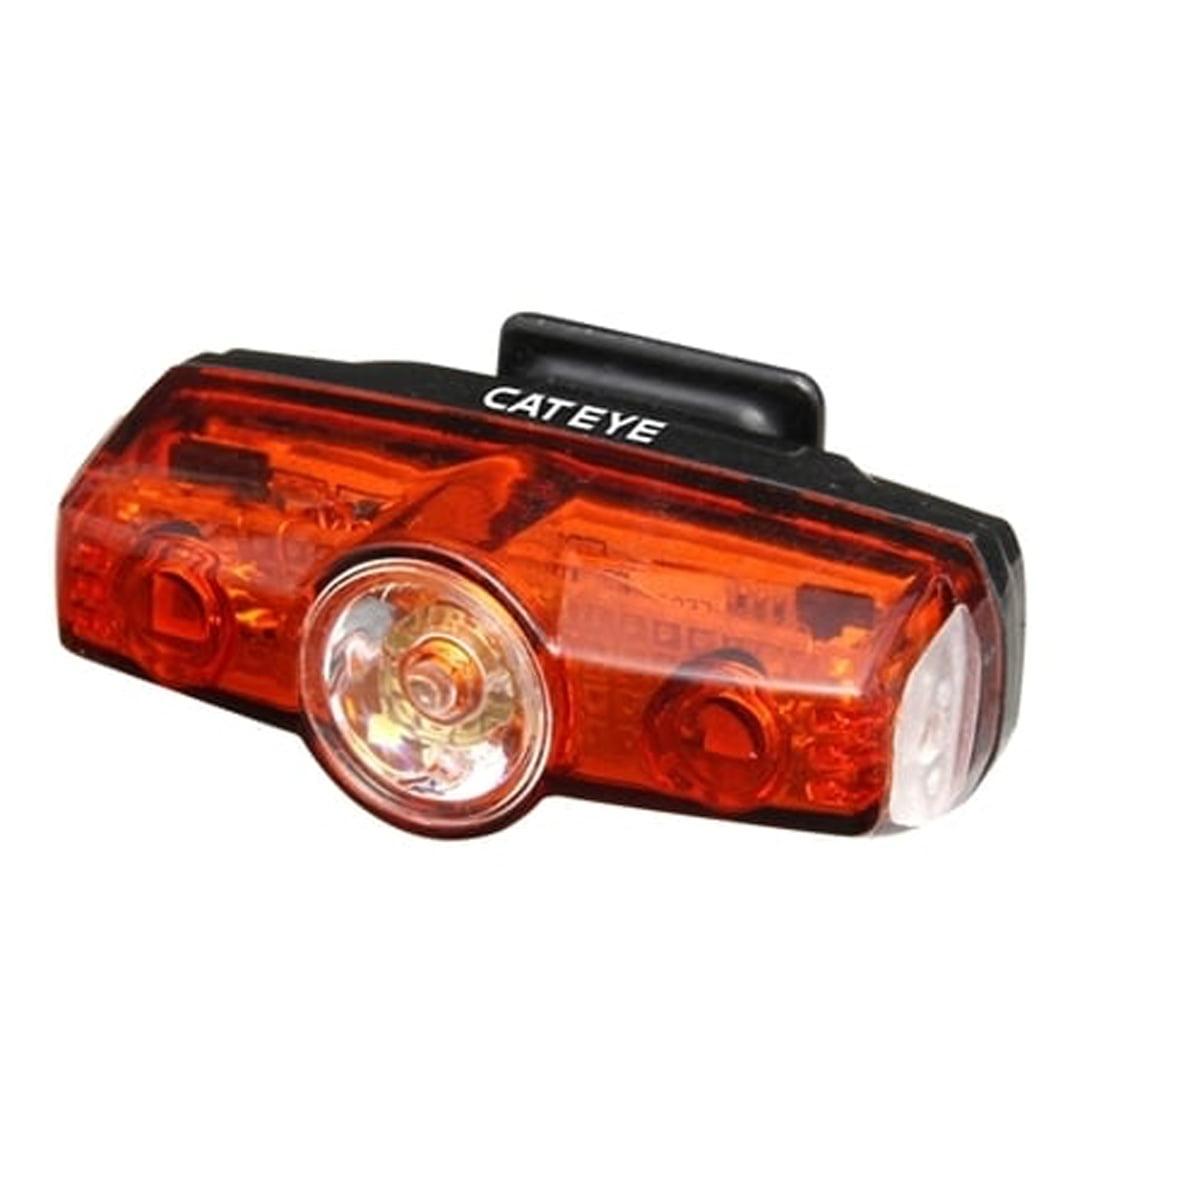 CatEye Rapid Mini 25 Lumen Rear Bicycle Tail Light - TL-LD635-R - 5446353